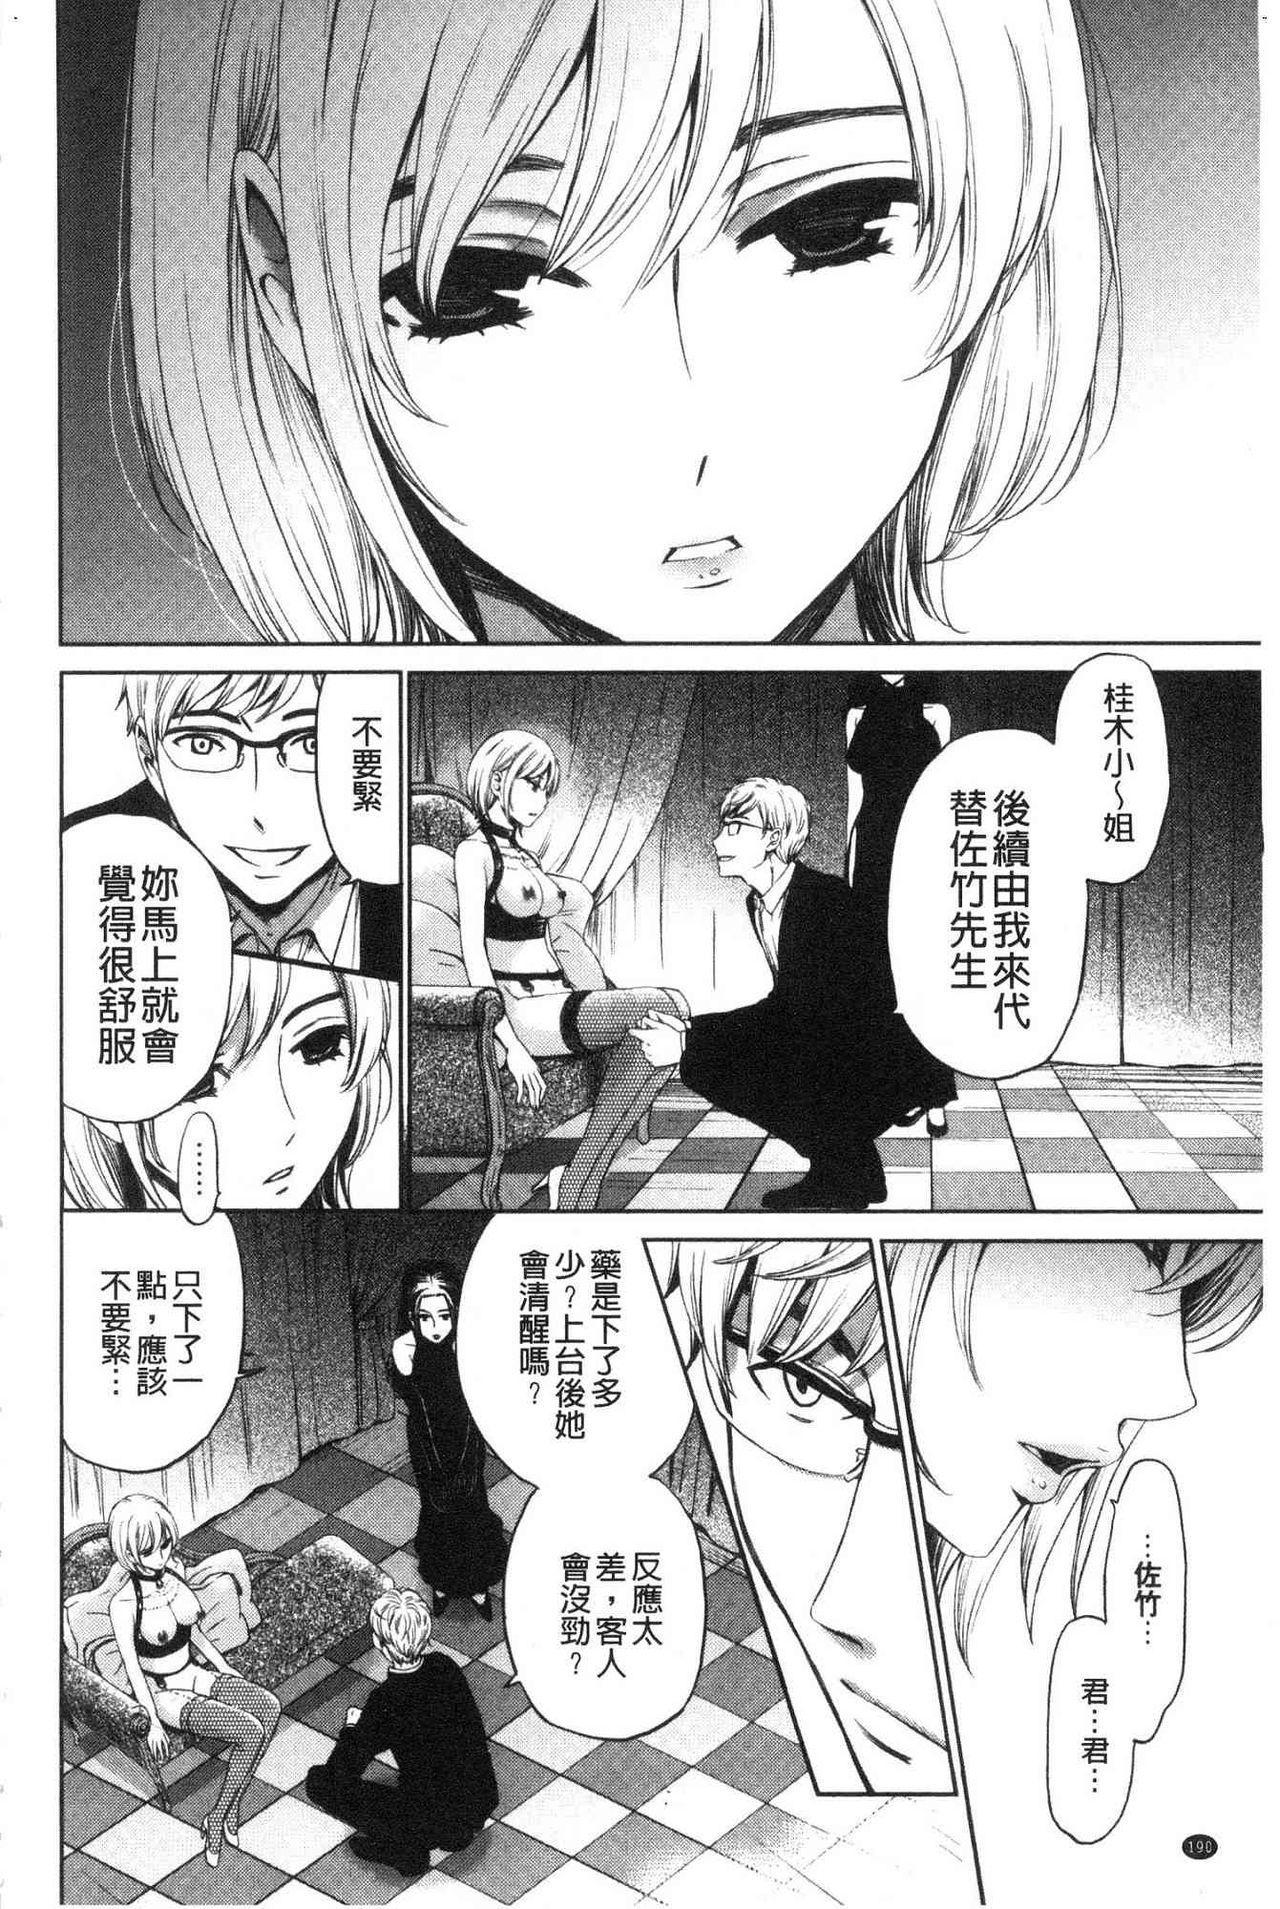 [Gotoh Akira]  21-ji no Onna ~Camera no Mae no Mesuinu~ 2 | 21時之女 ~鏡頭前的牝犬~ 2 [Chinese] 191